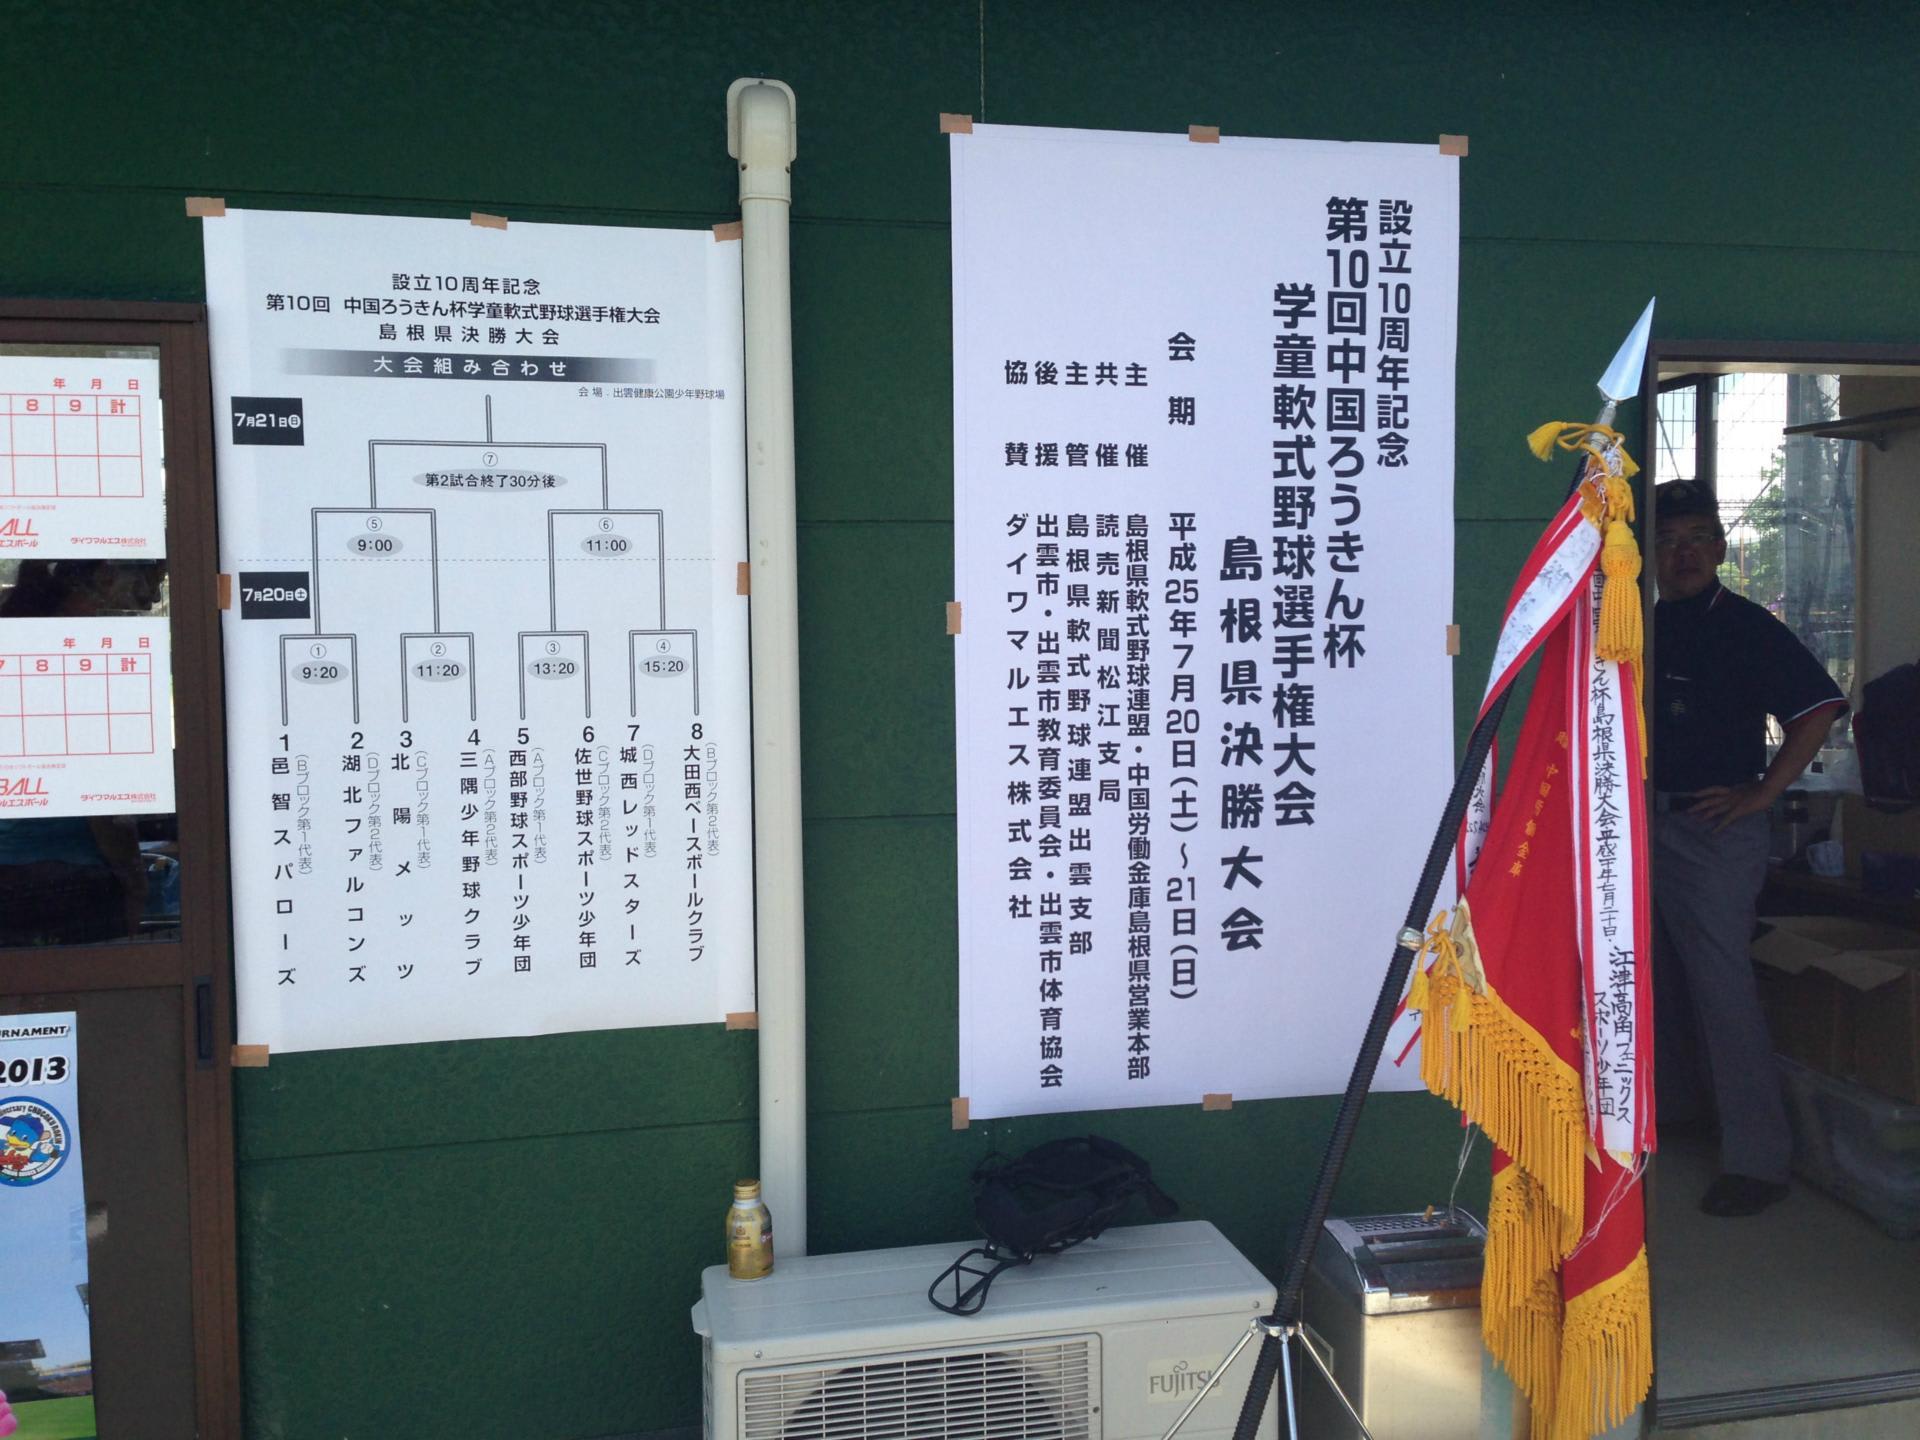 「JA共済むてきカップ学童軟式野球鳥取県大会」を開催 | JA共済 ちいきのために 47都道府県の地域貢献活動